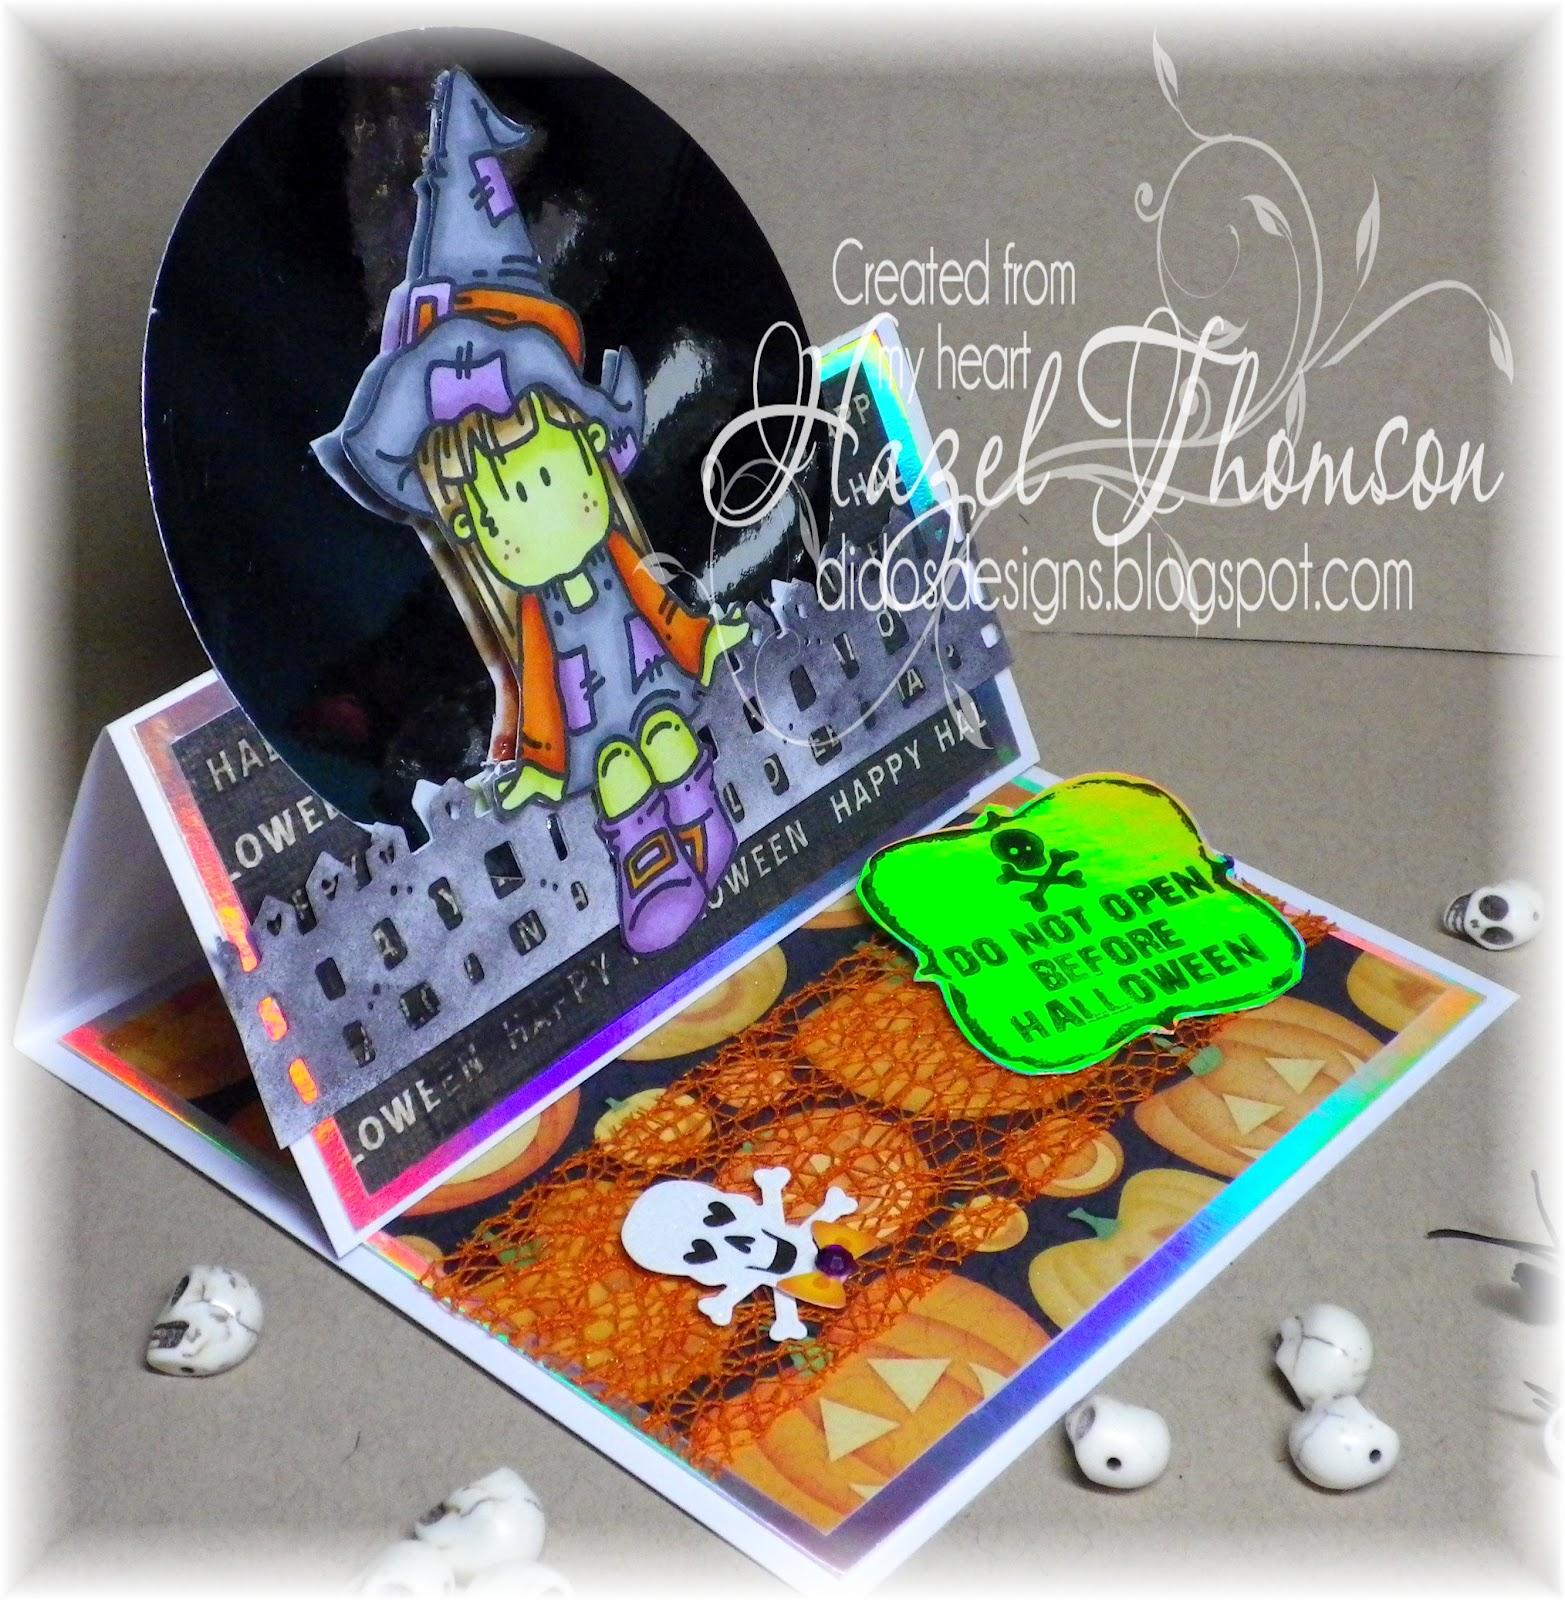 http://1.bp.blogspot.com/-RSLG7u9tlio/UGnM13oXgXI/AAAAAAAAIzY/PGTkzQSck6s/s1600/Cards+By+Dido%27s+Designs+017.JPG